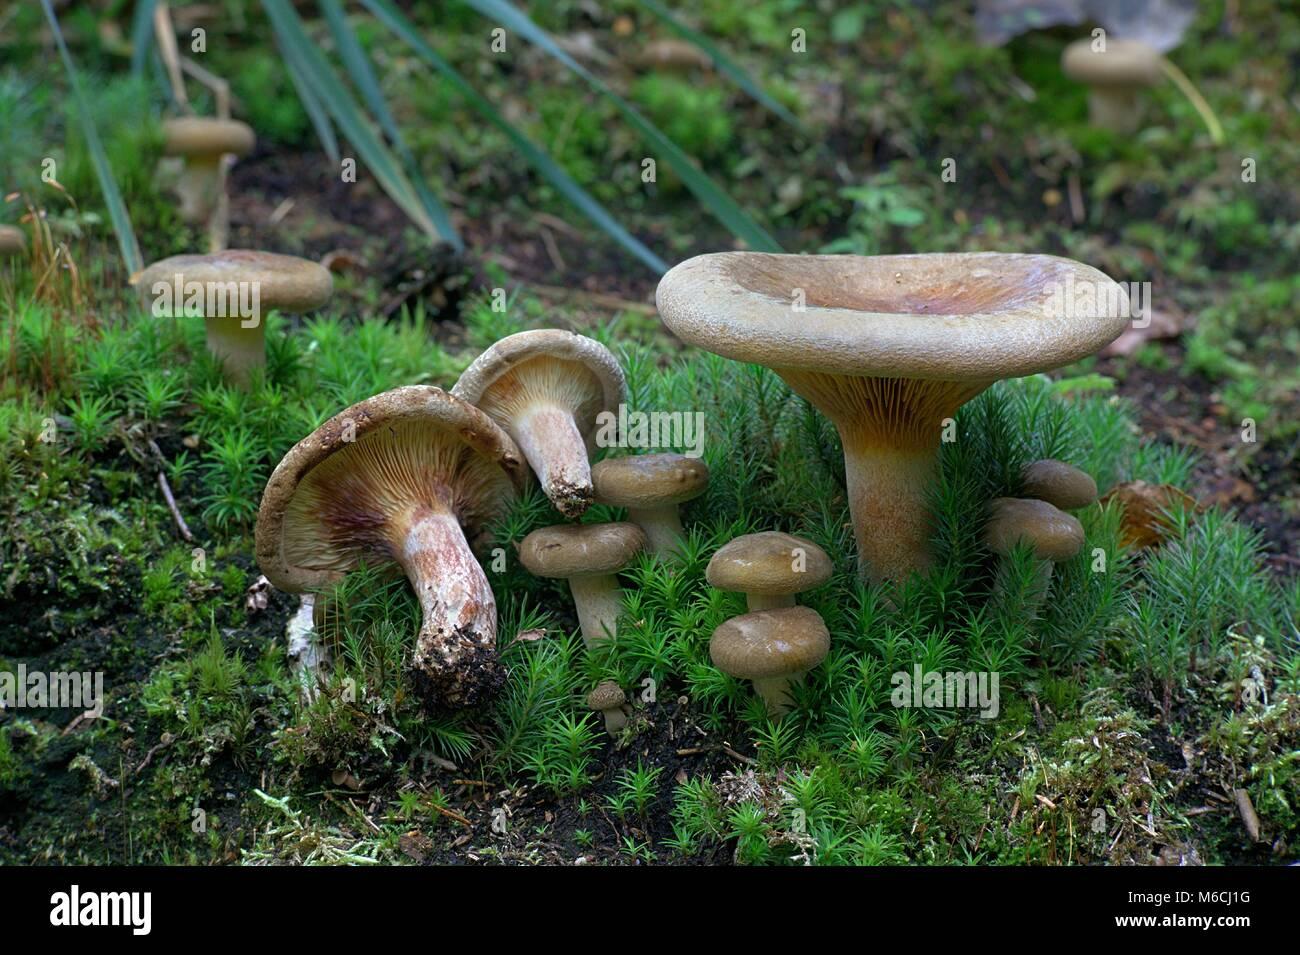 deadly poisonous mushroom stock photos amp deadly poisonous